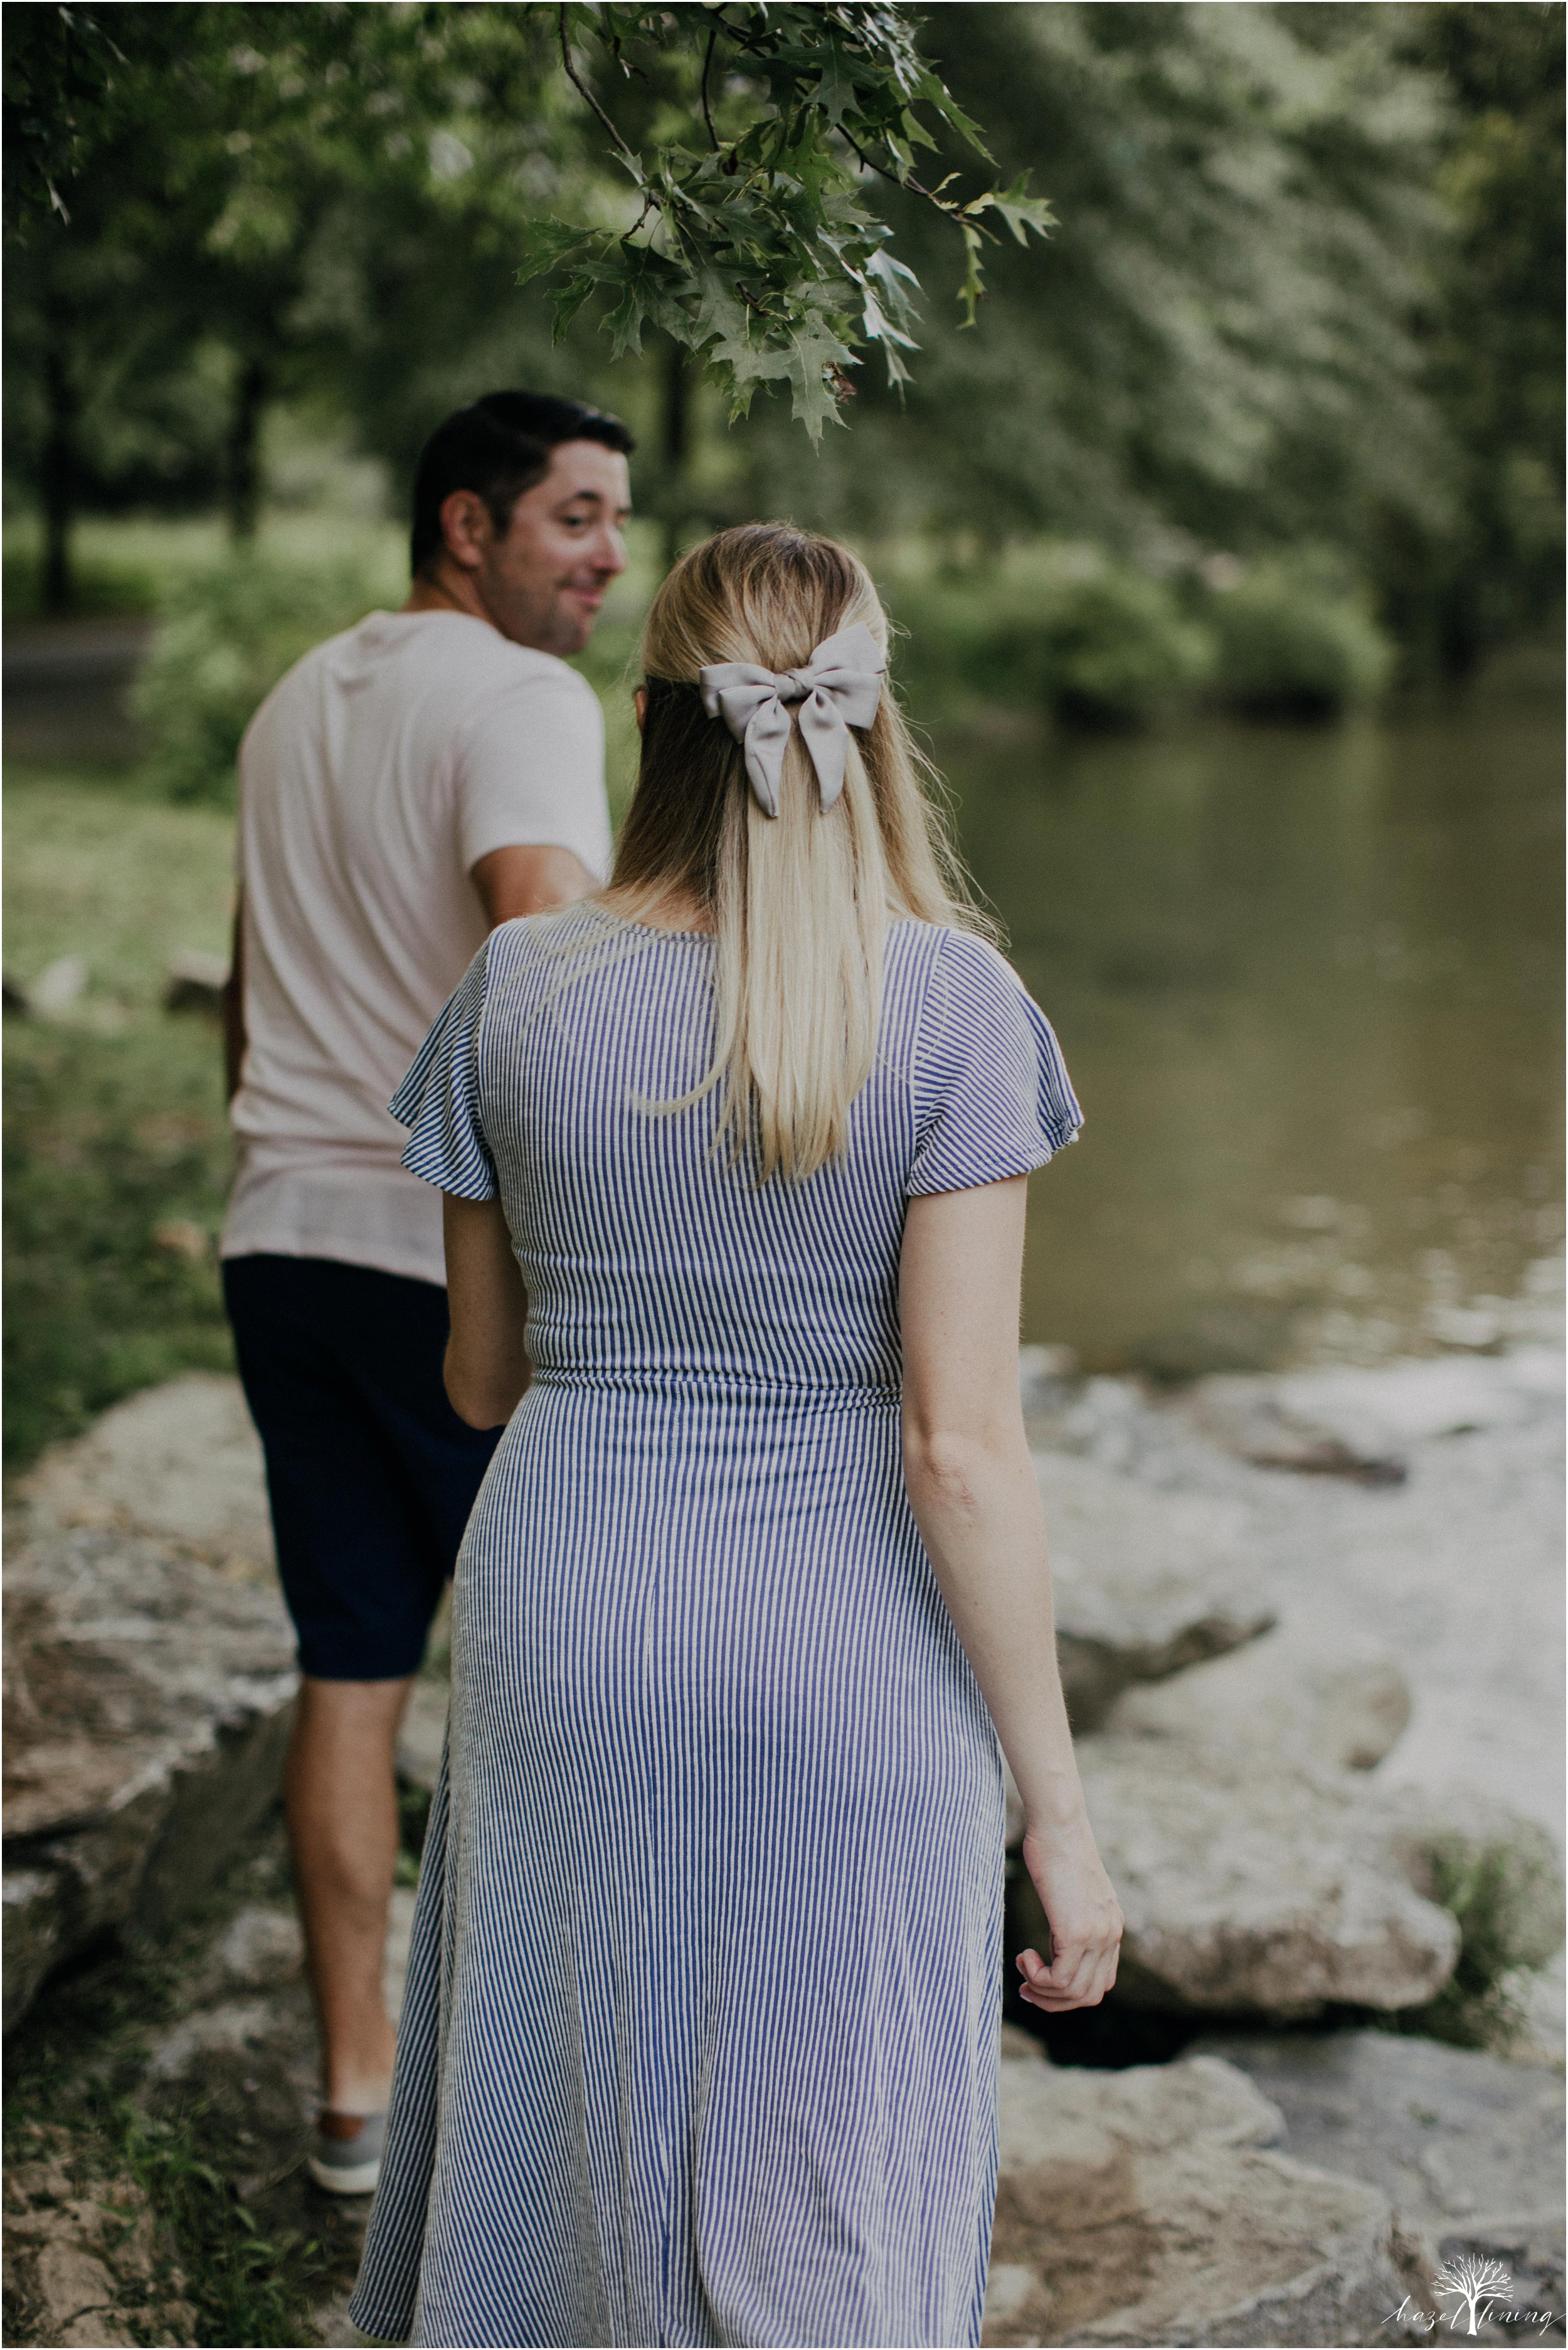 ashley-fillmore-steve-reimer-trexler-nature-preserve-summer-engagement-session-schnecksville-pennsylvania-hazel-lining-photography-destination-elopement-wedding-engagement-photography_0009.jpg